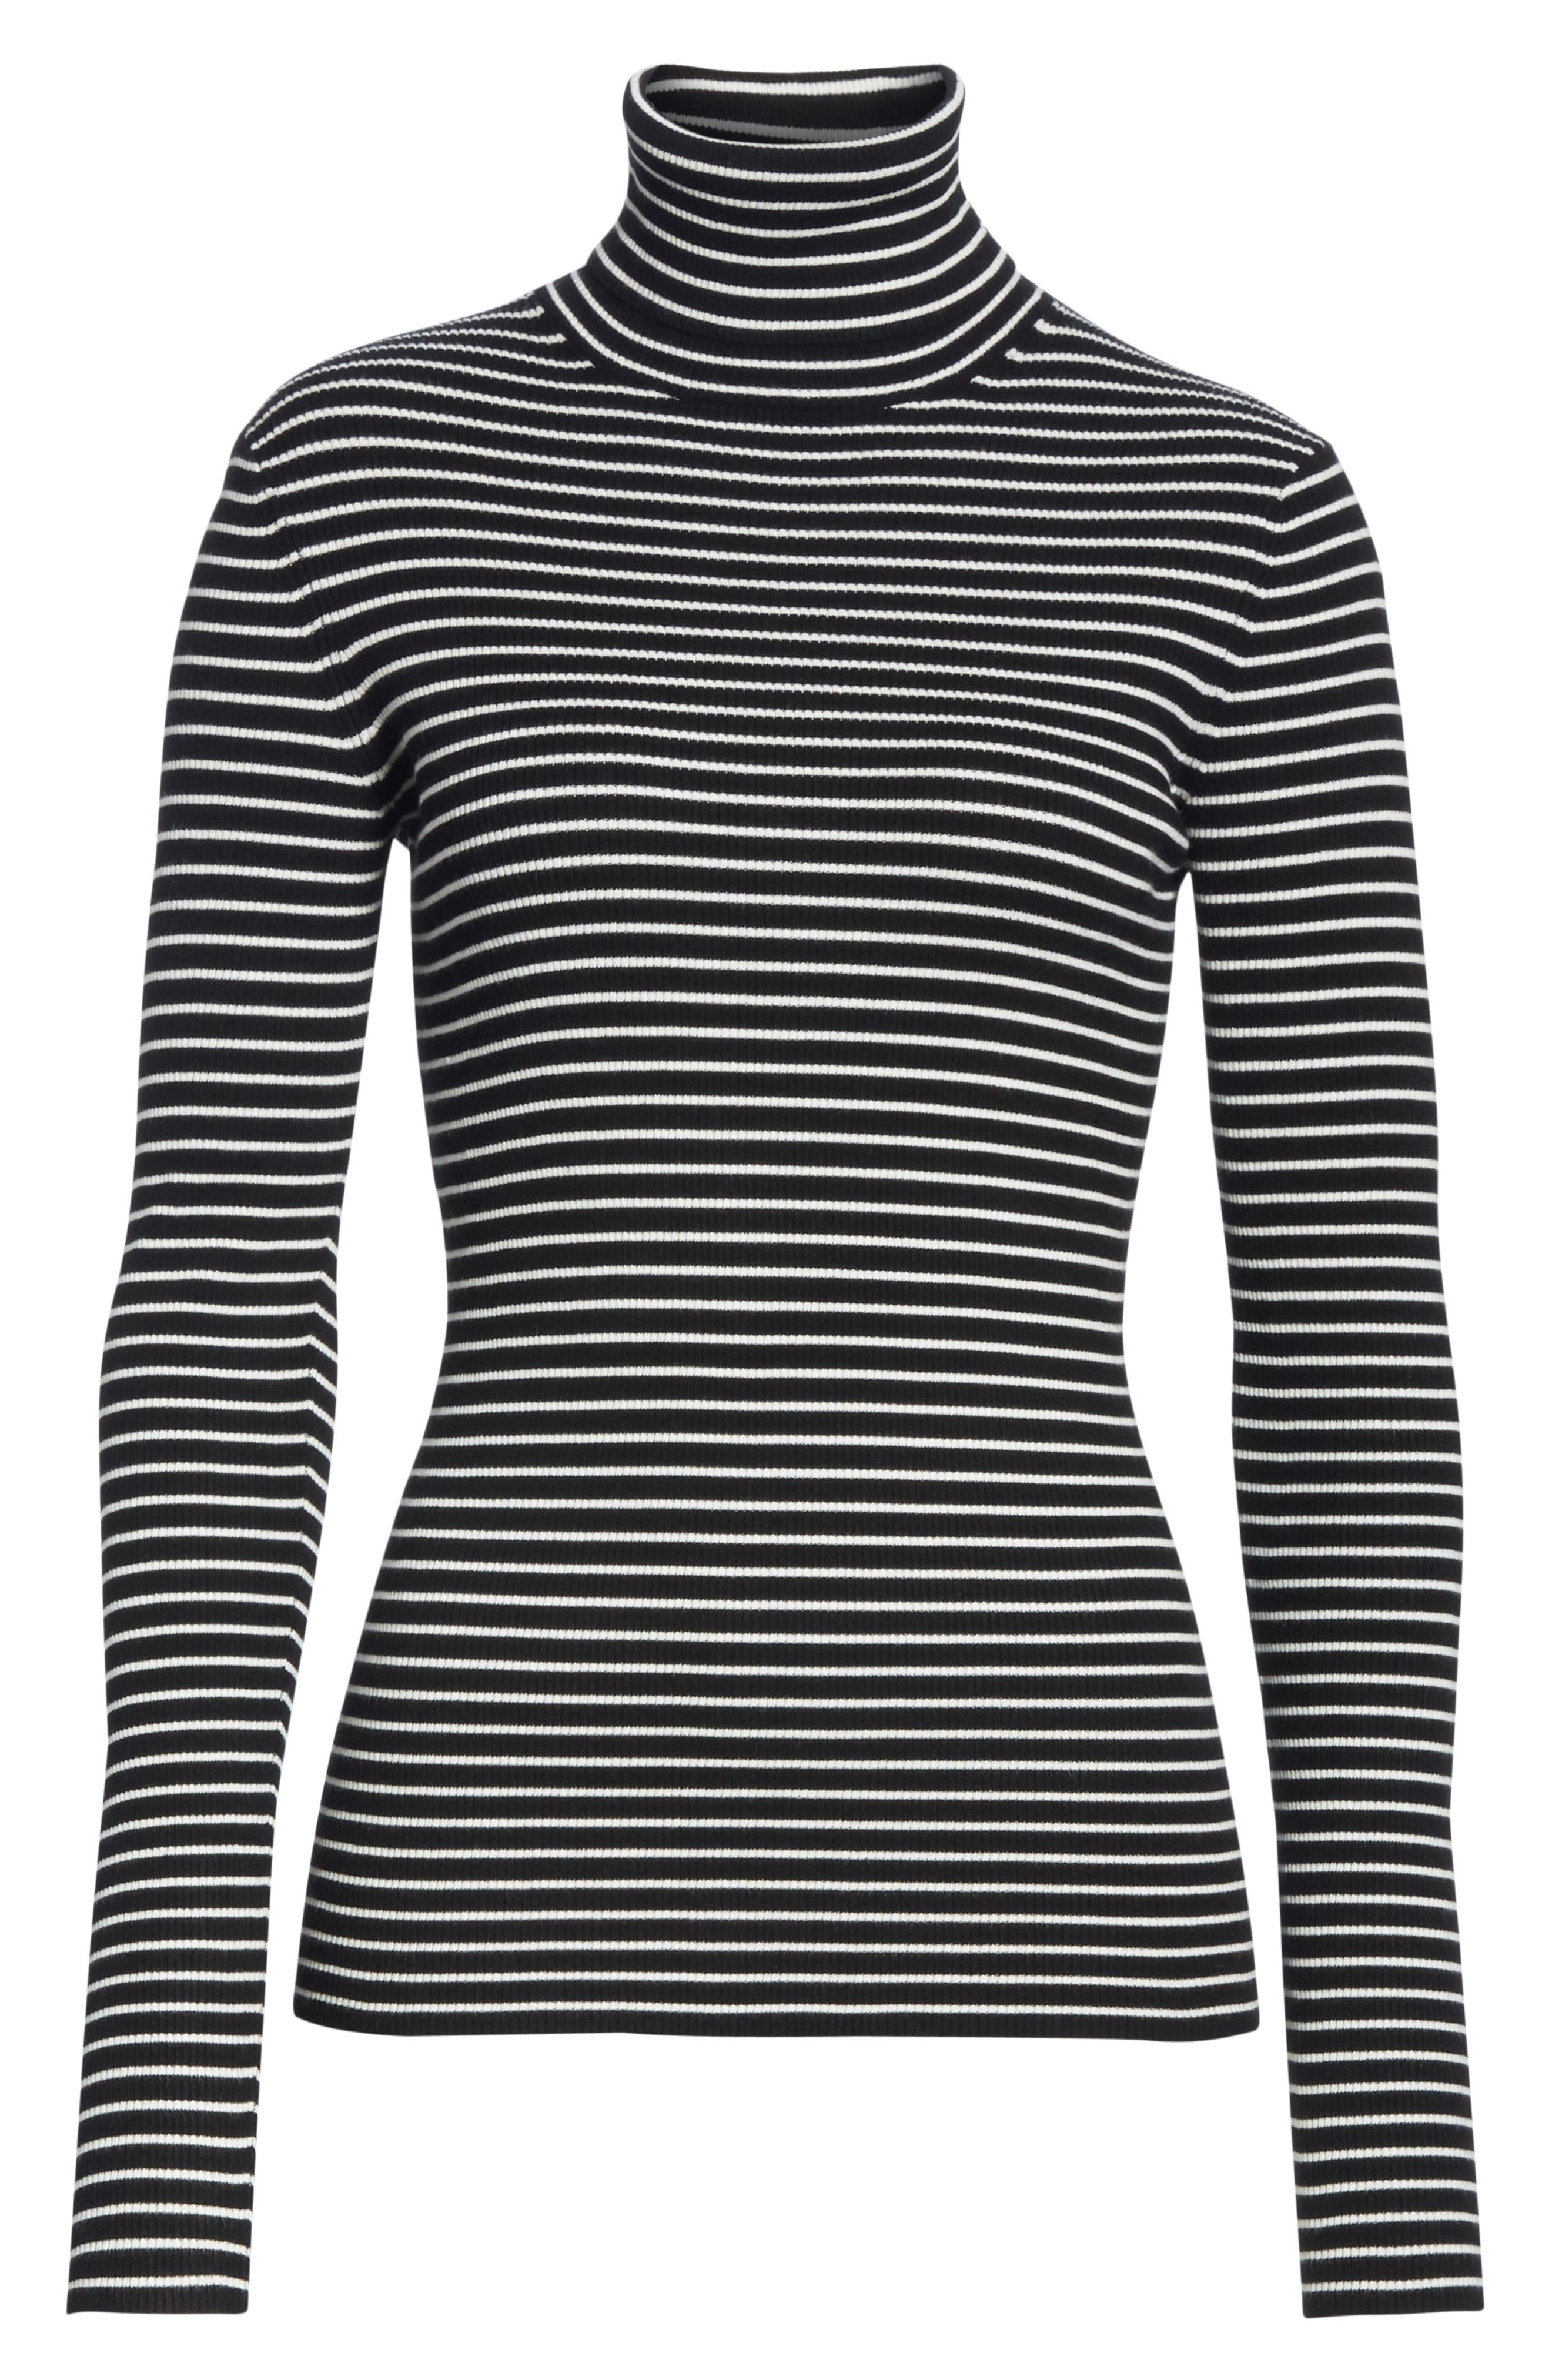 Fine Line Stripe Turtleneck,                             Alternate thumbnail 6, color,                             BLACK AND WHITE STRIPES